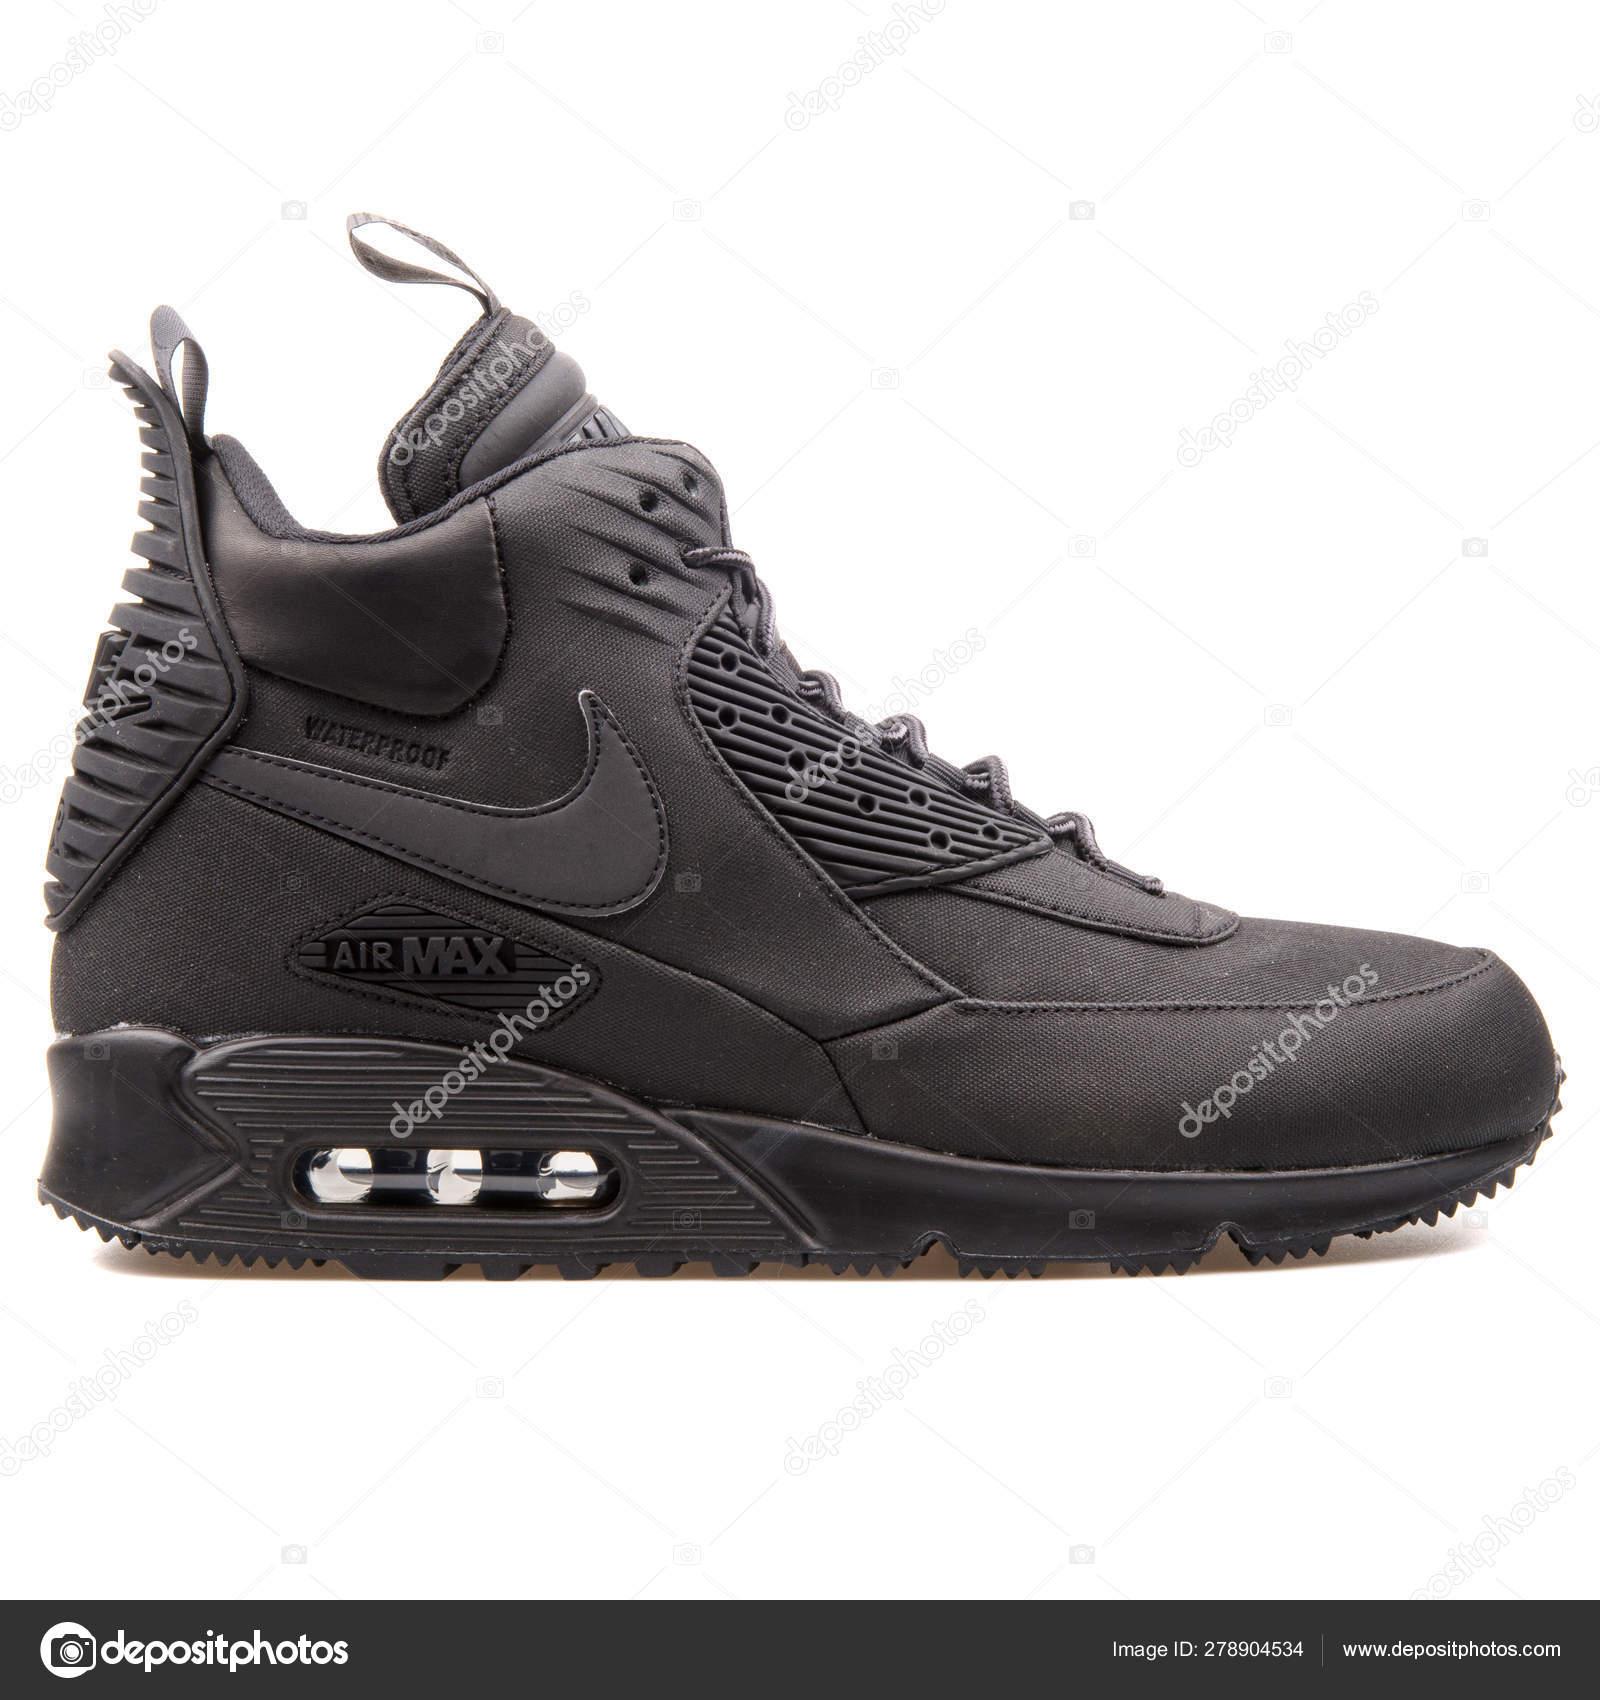 Nike Air Max 90 Sneakerboot Winter black sneaker 278904534